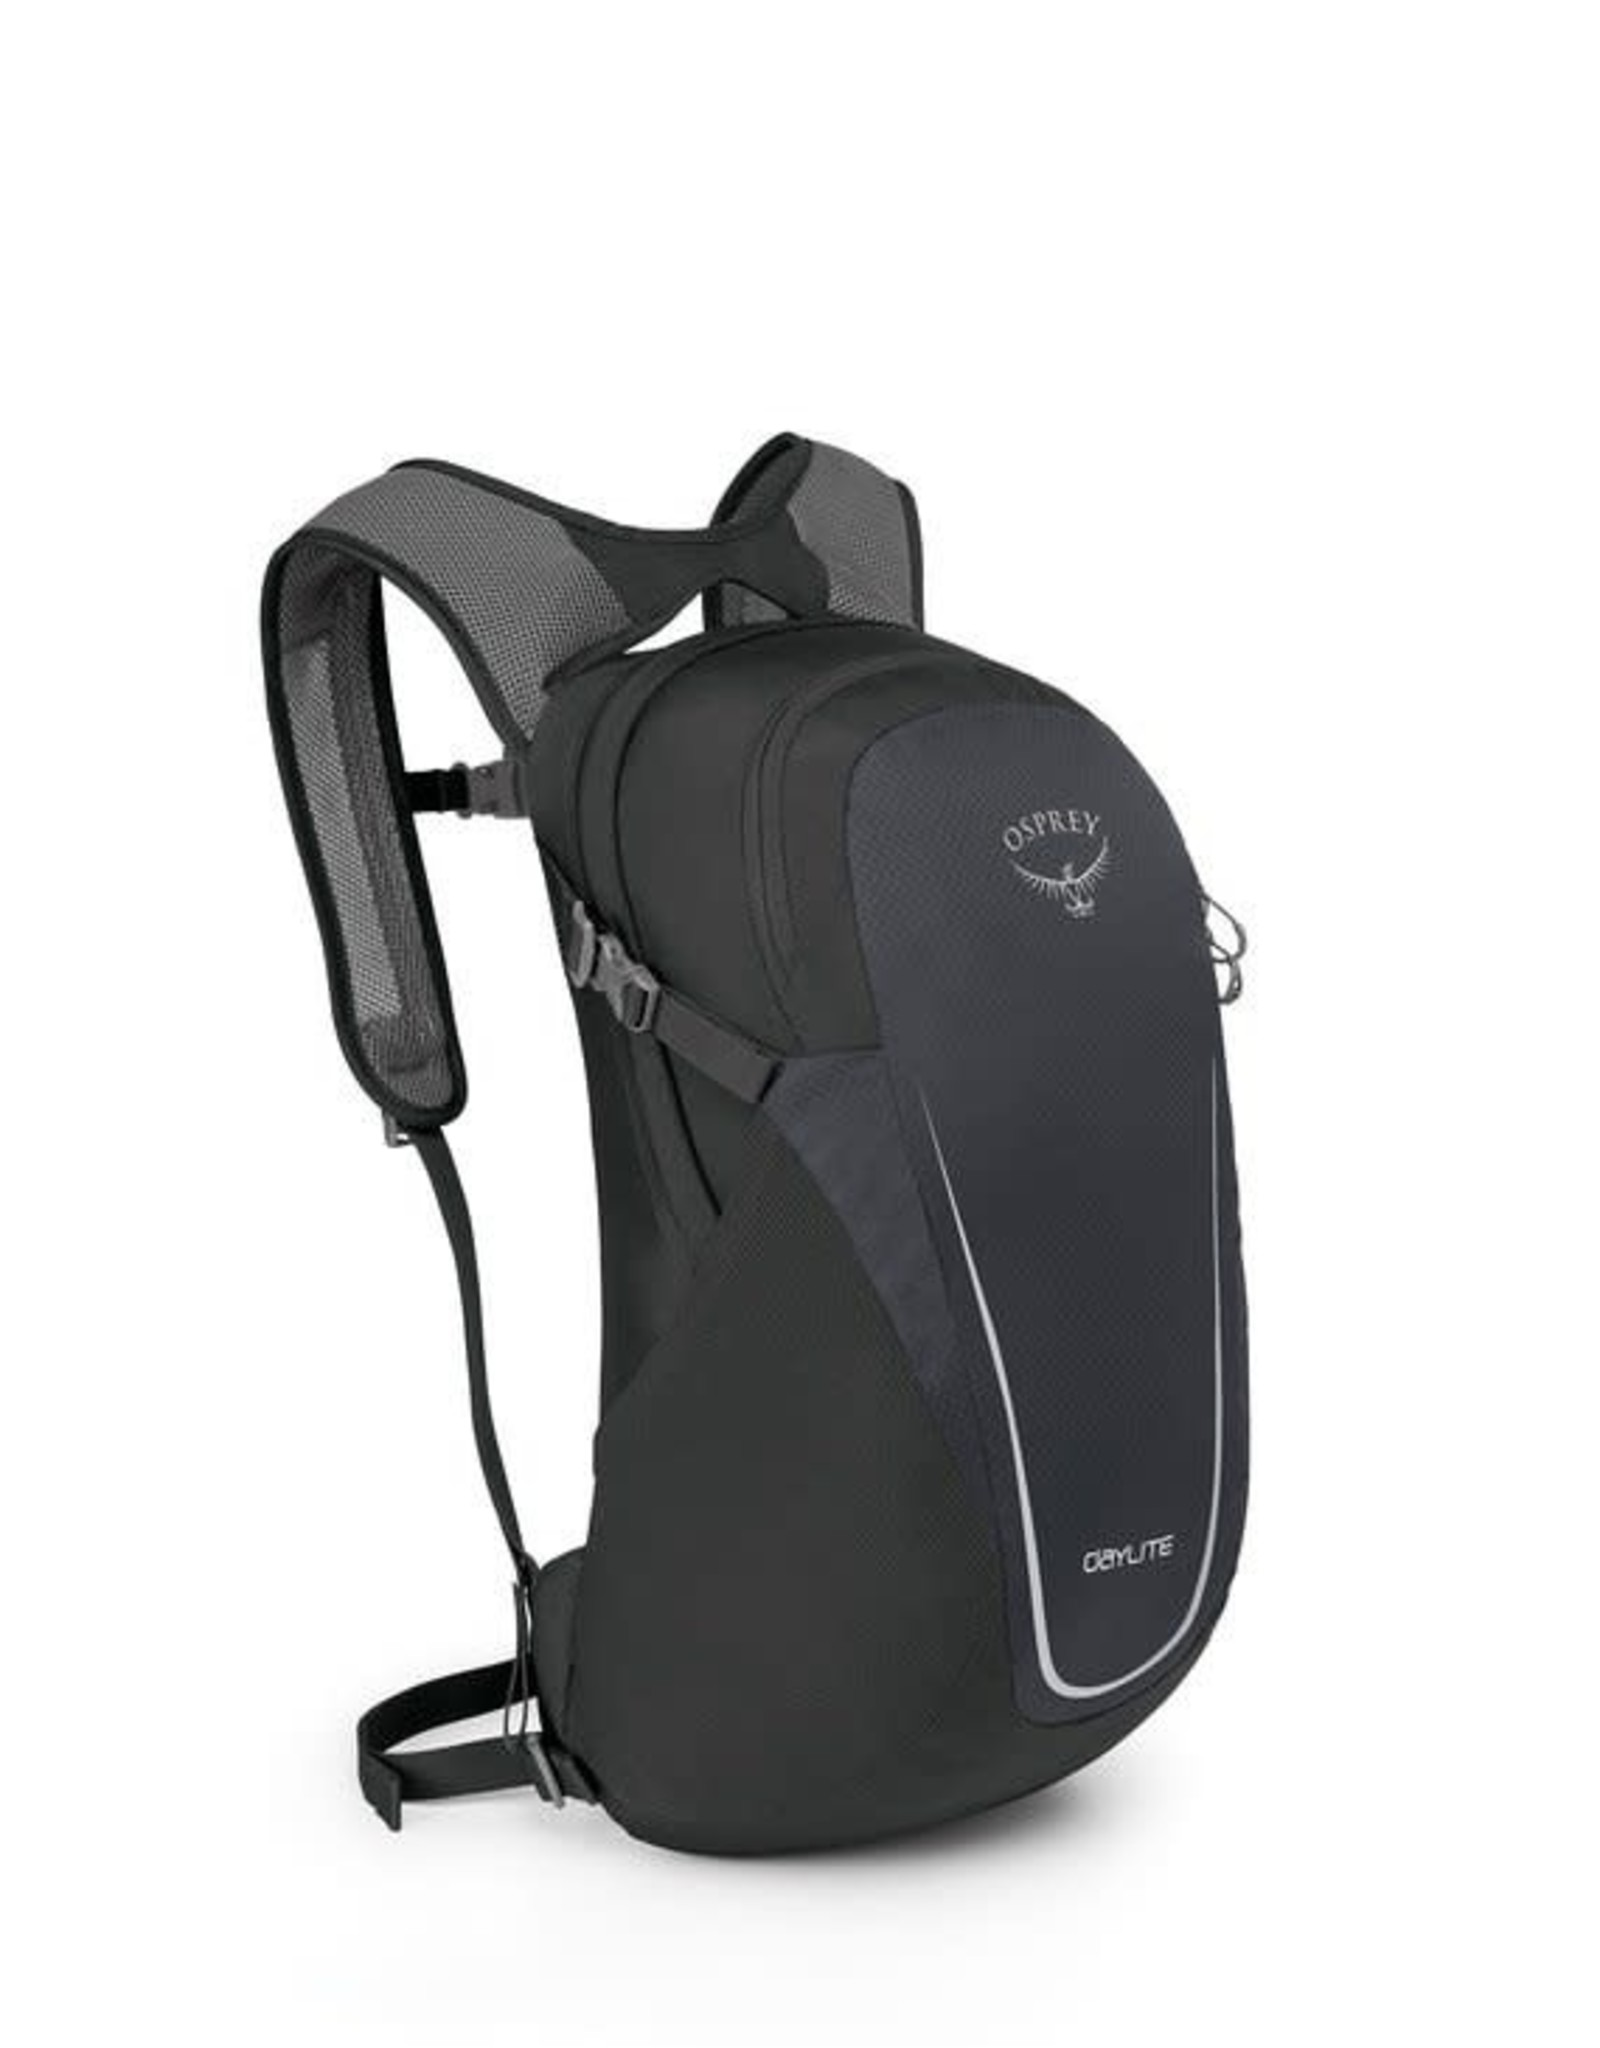 Osprey Osprey DayLite Pack